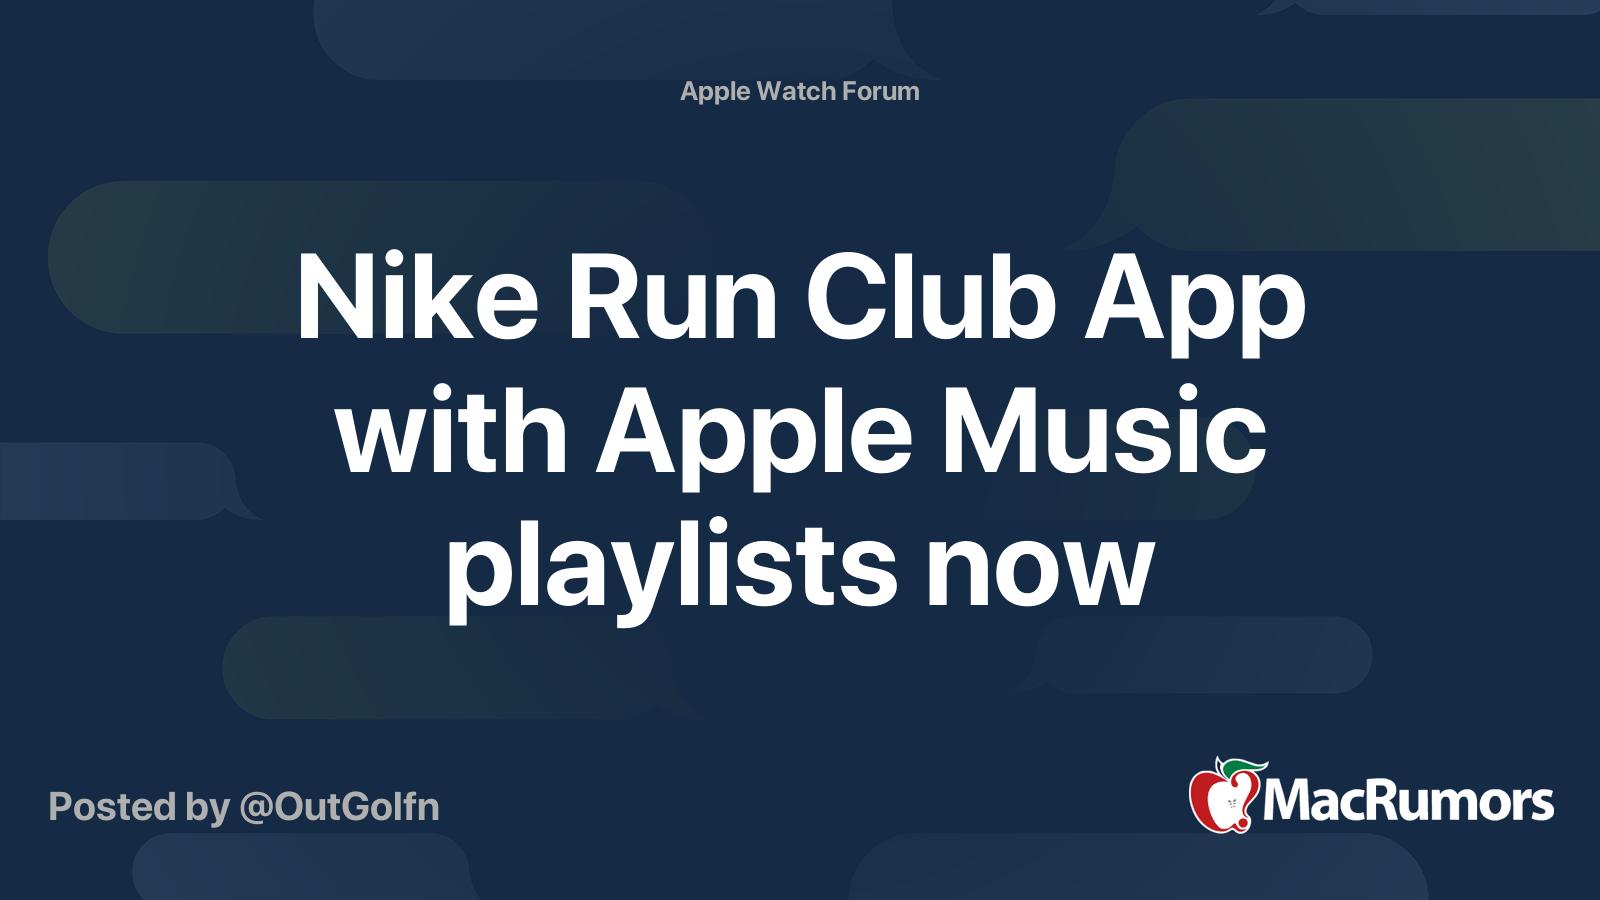 matraz Salto molestarse  Nike Run Club App with Apple Music playlists now   MacRumors Forums